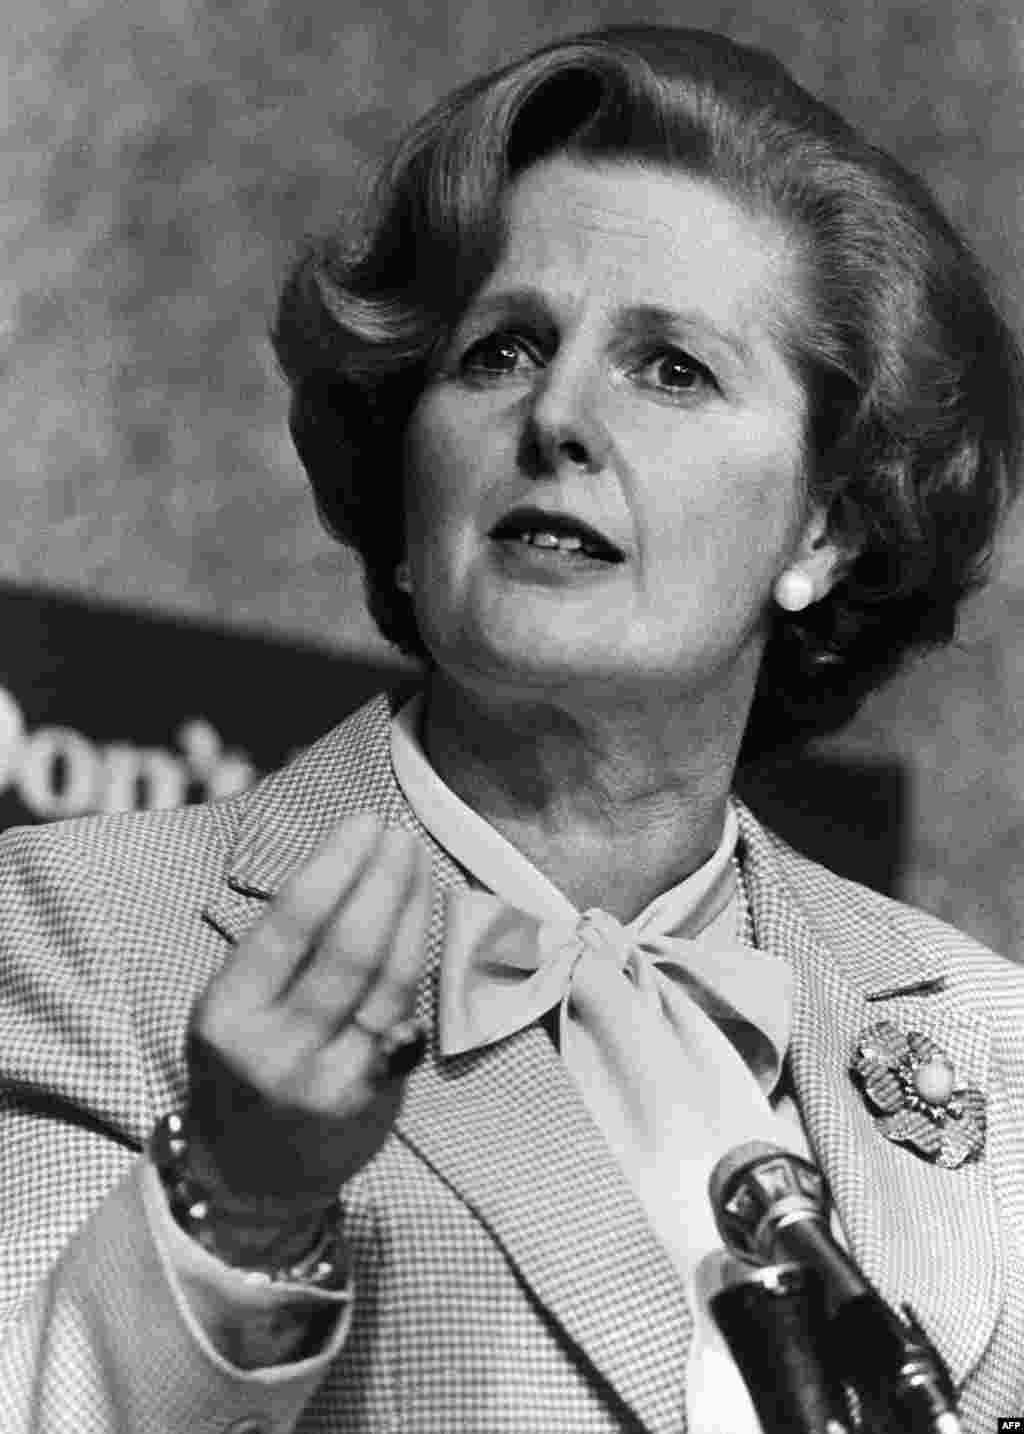 Margaret Thatcher in London in April 1979